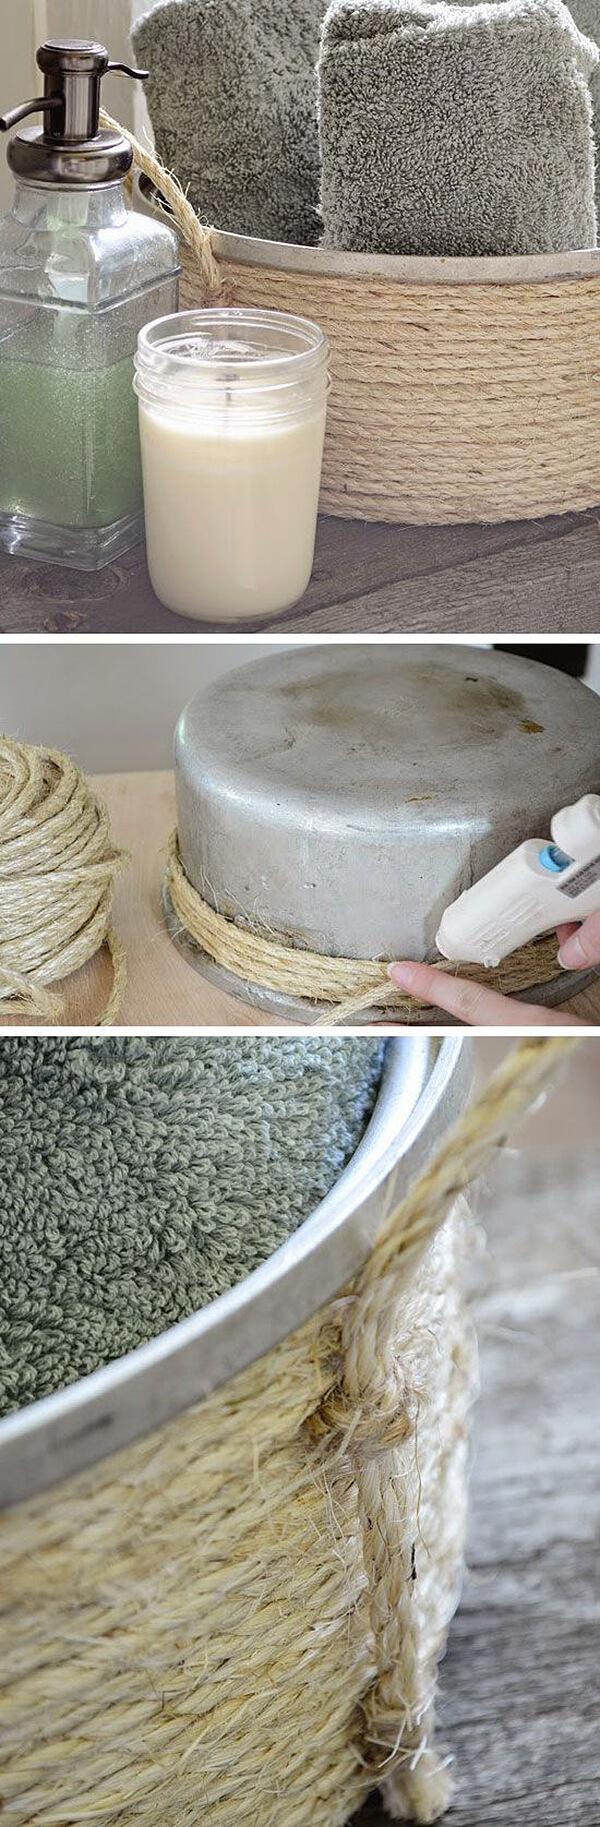 Antique Pot and Twine Basket